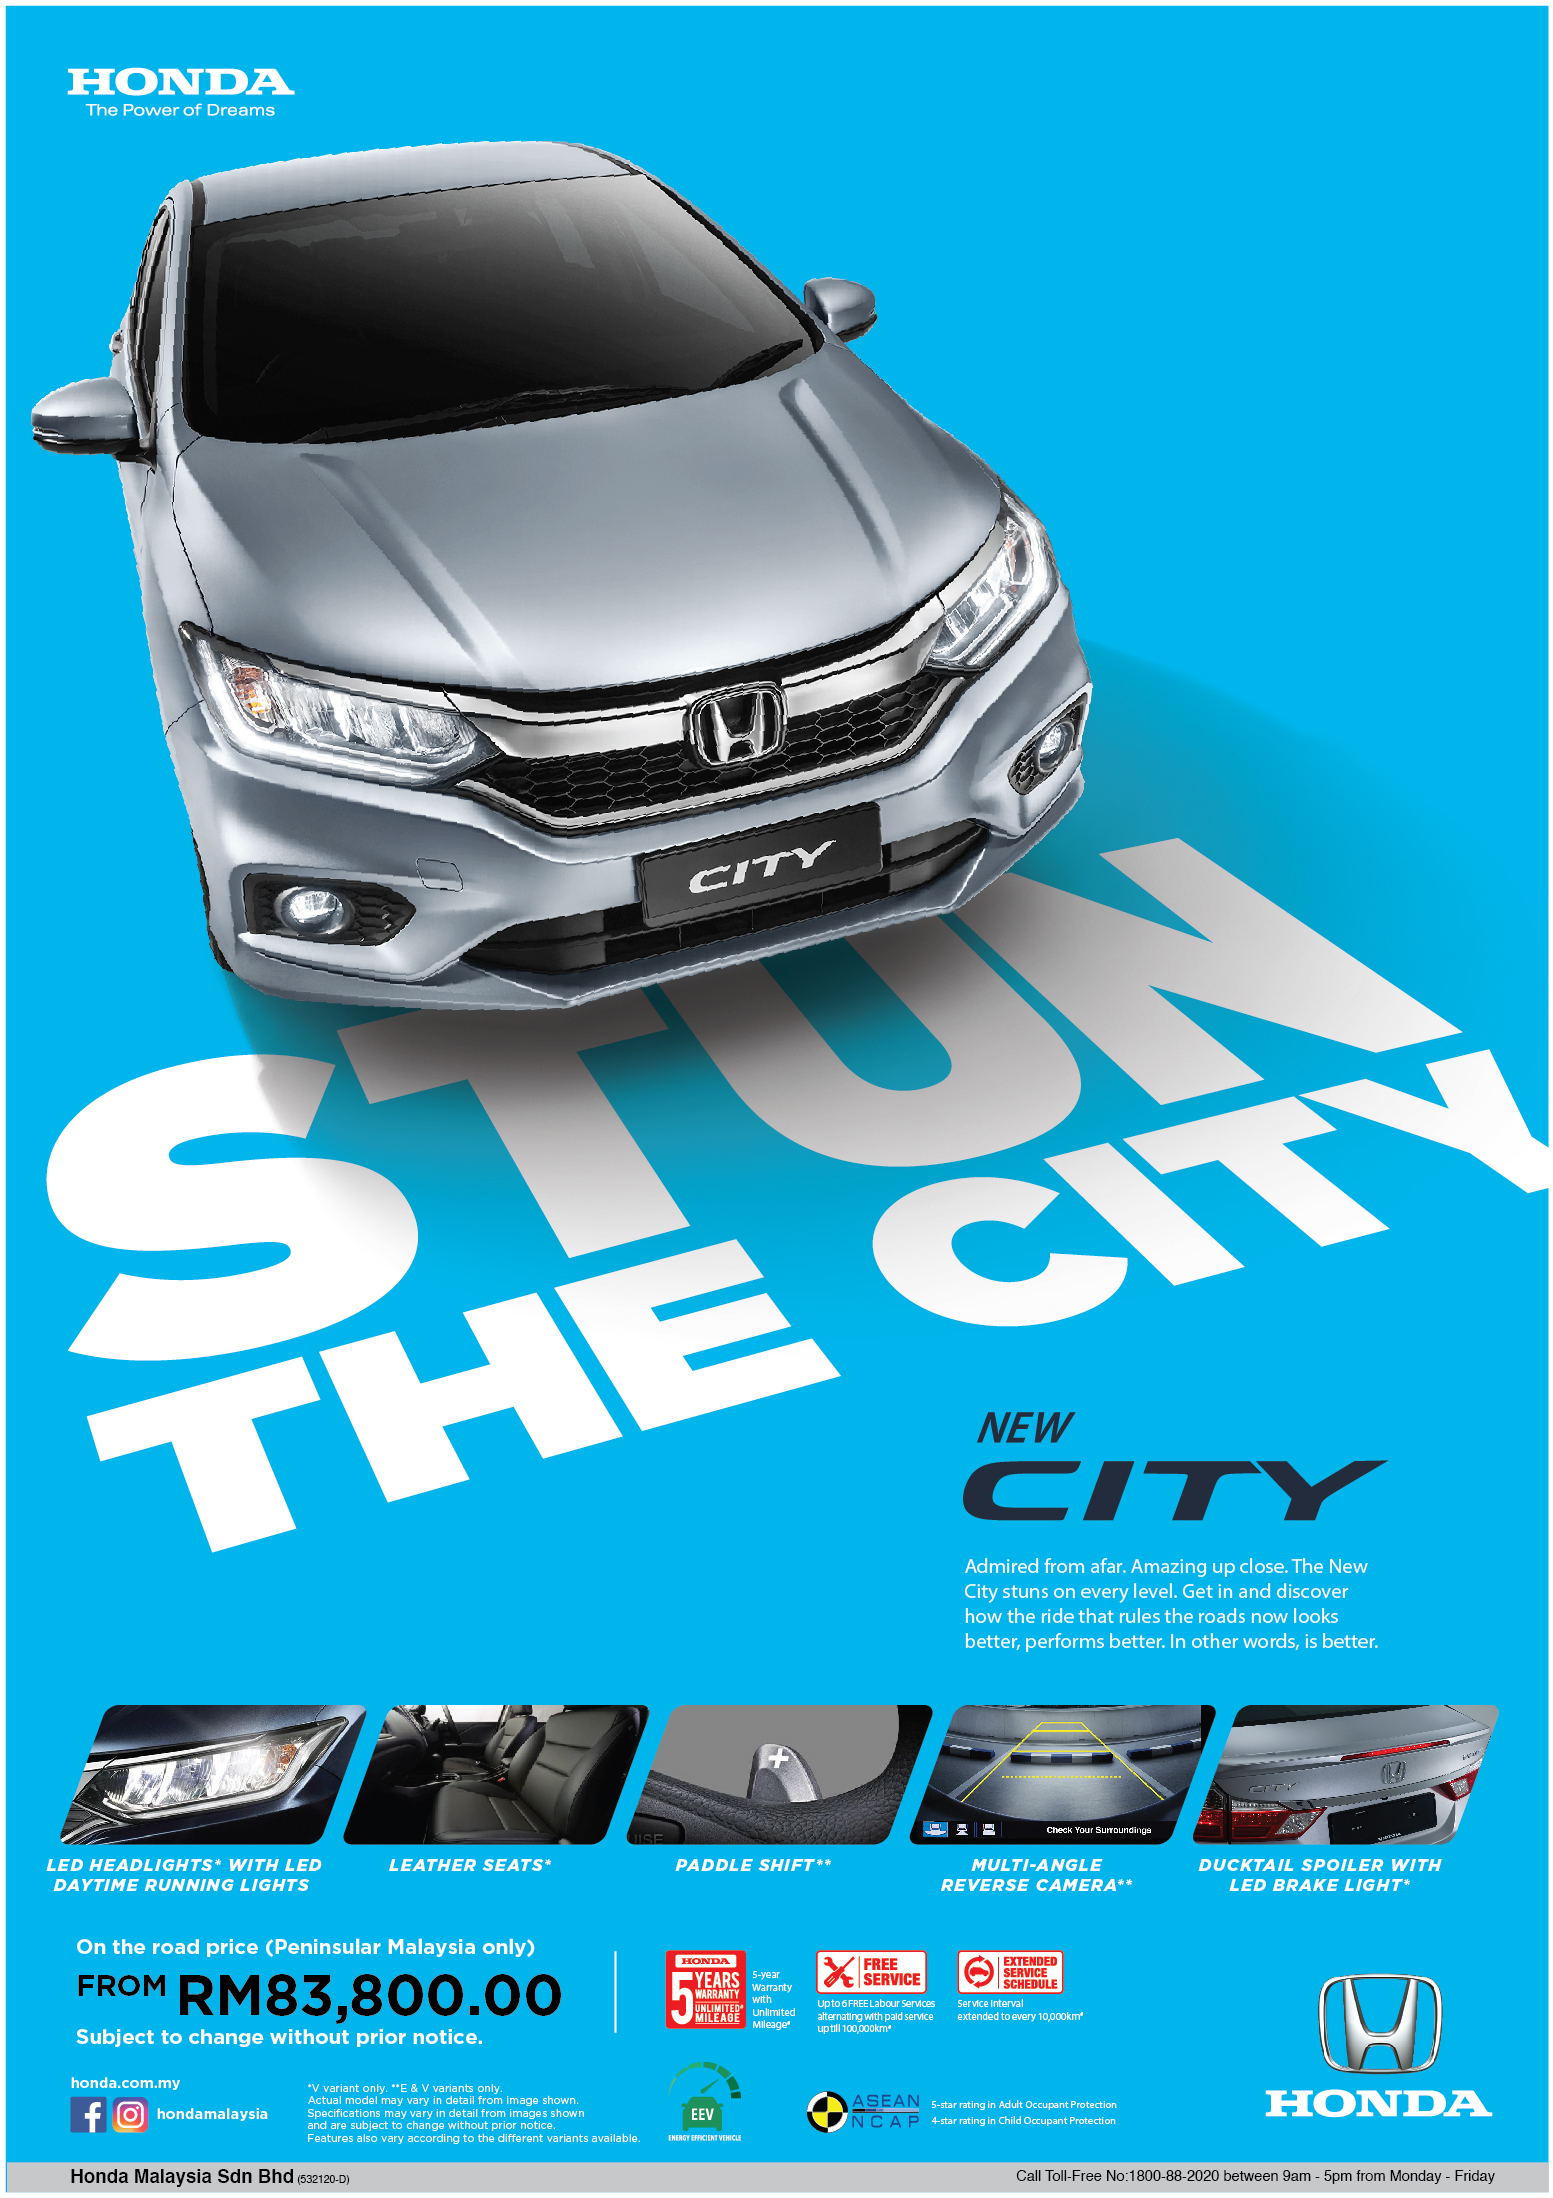 Honda City minor model change on Behance